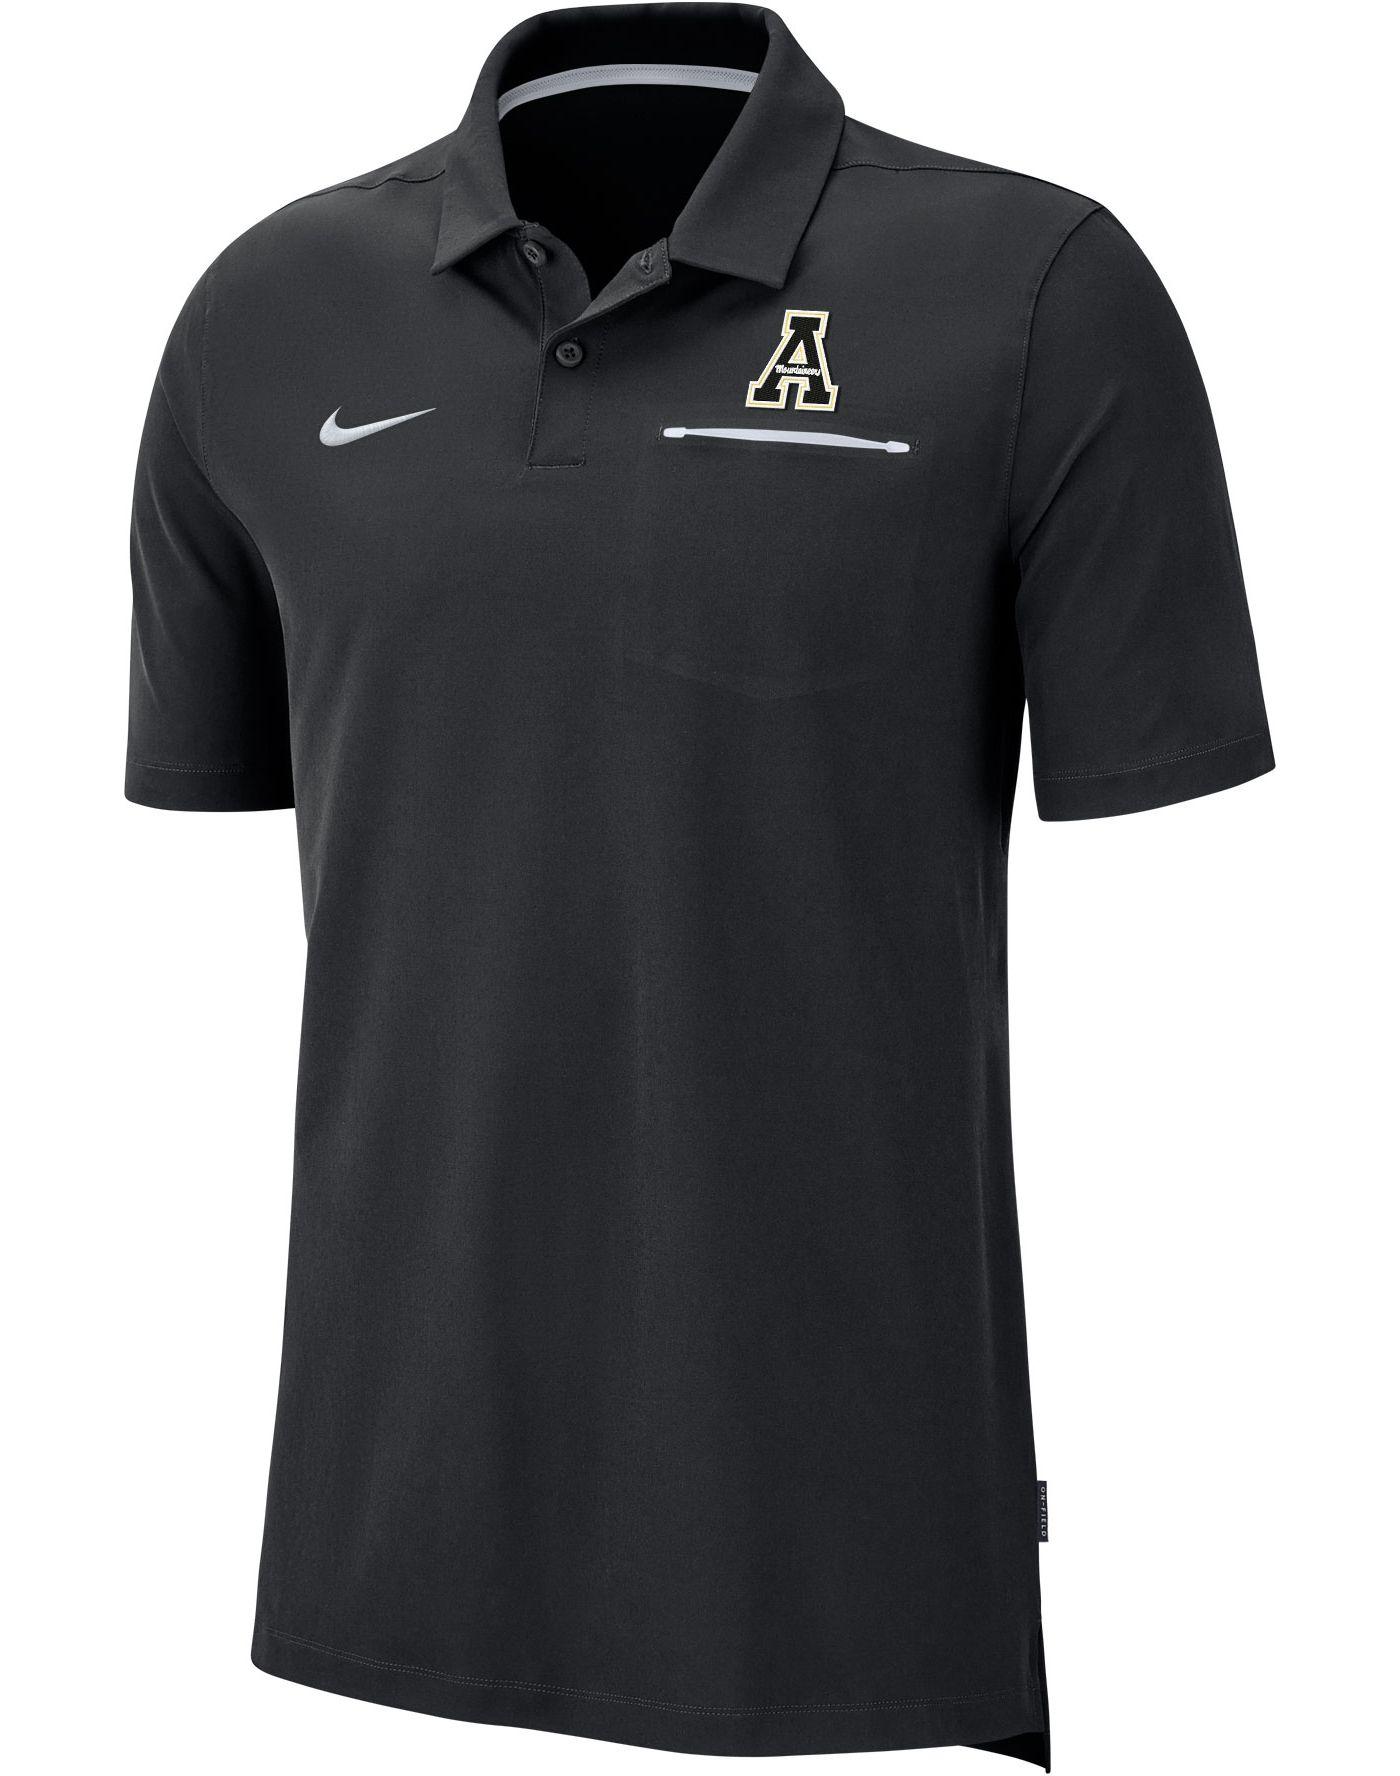 Nike Men's Appalachian State Mountaineers Dri-FIT Elite Football Sideline Black Polo